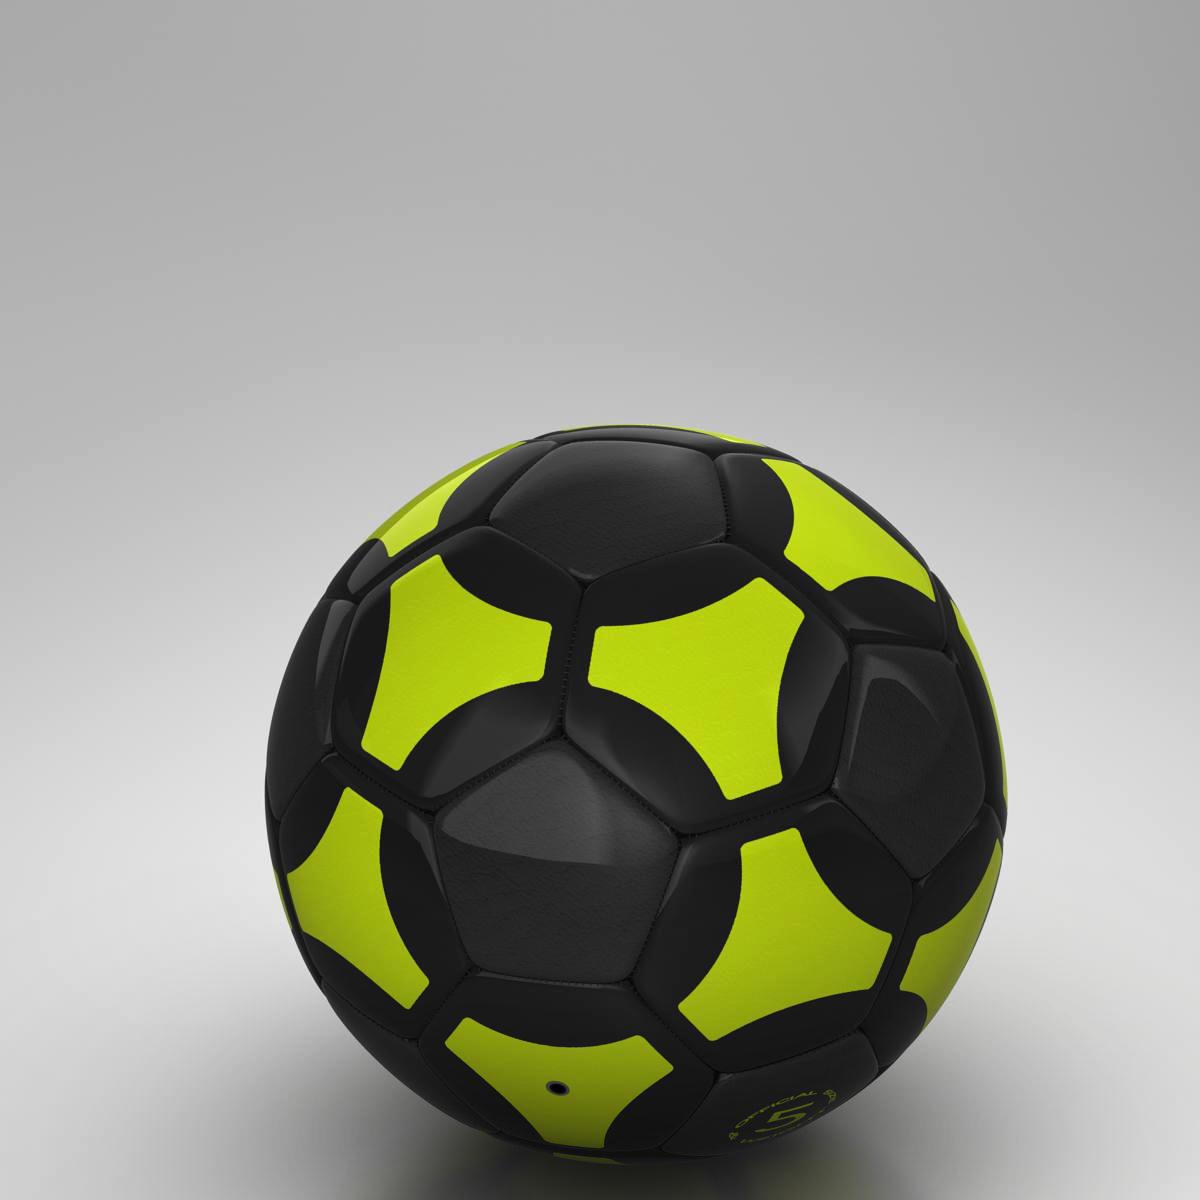 soccerball black yellow 3d model 3ds max fbx c4d ma mb obj 204212